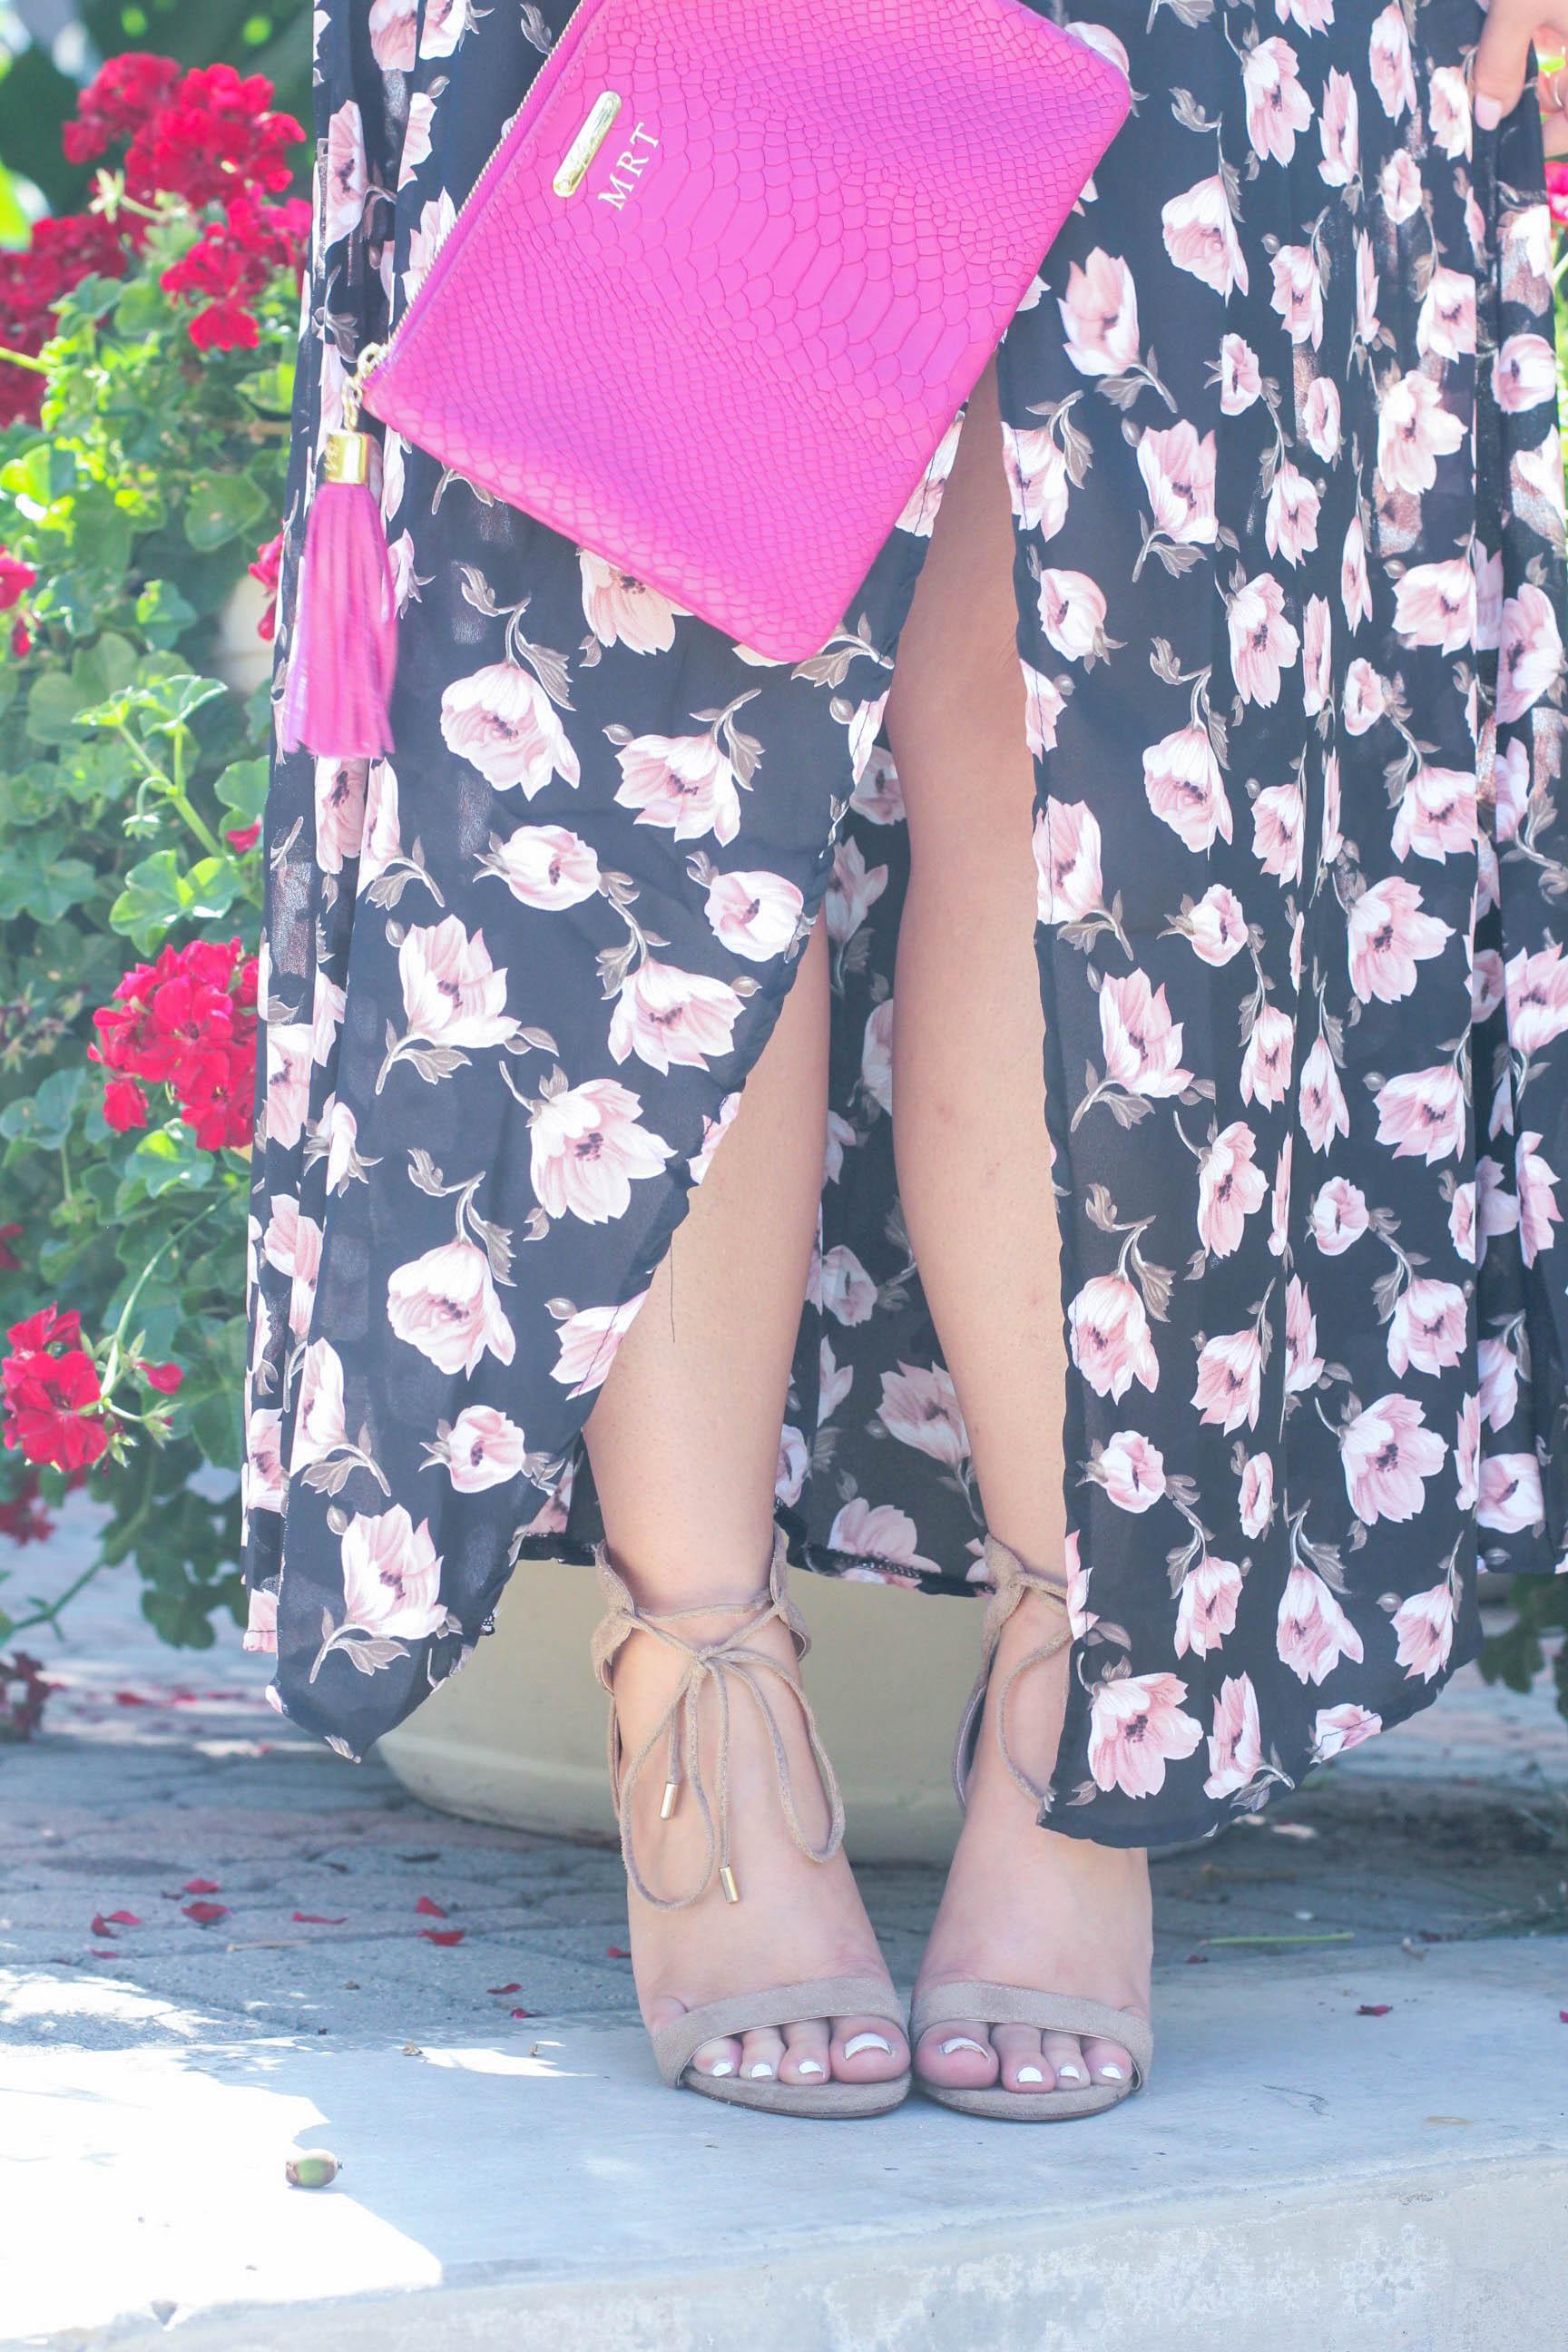 missyonmadison, melissa tierney, ami clubwear, floral maxi dress, ami clubwear maxi dress, fashion blogger, style blogger, fall style, la blogger, fall fashion, fall 2016 trends, ootd, fall outfit inspo, gigi ny, magenta clutch, gigi ny magenta clutch, nude lace up heels, nude heels,